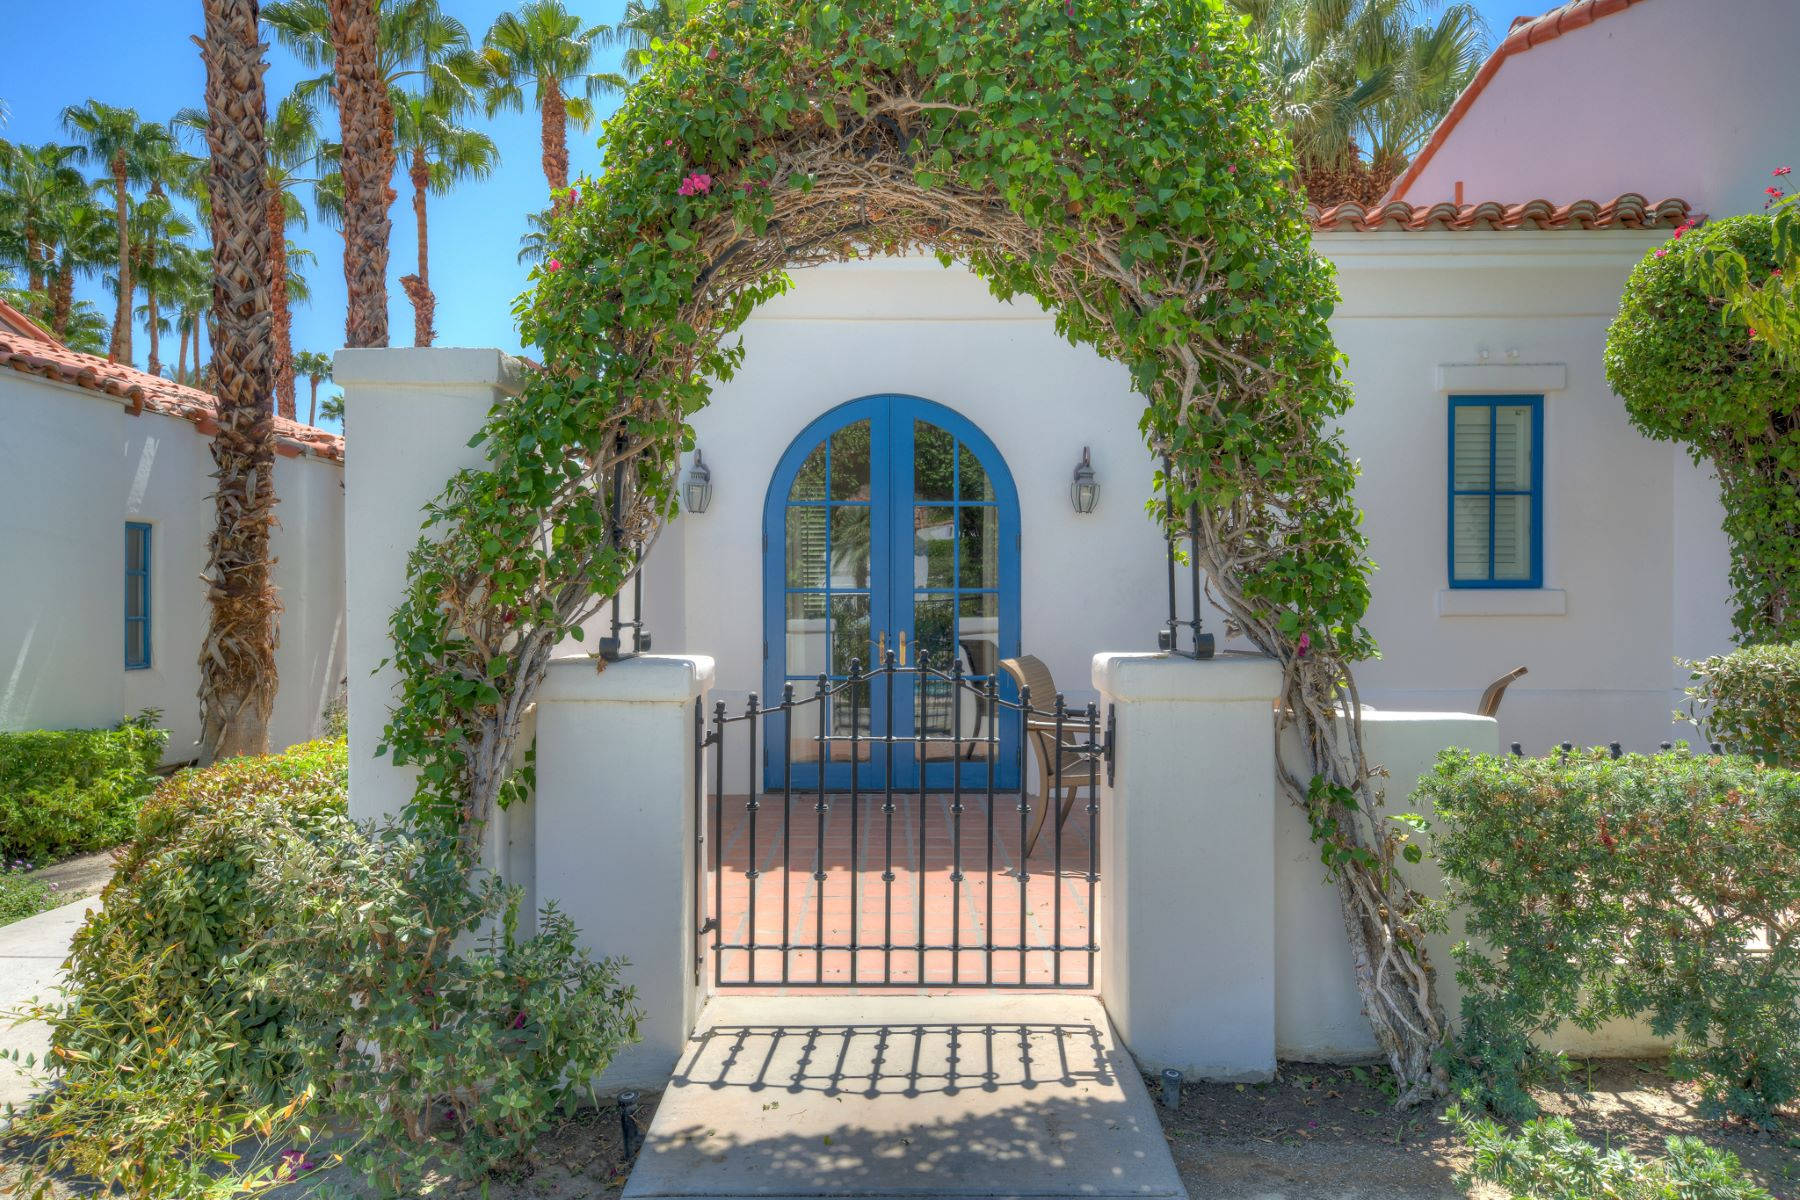 Single Family Homes for Active at The La Quinta Resort Spa Villa 49500 Avenida Obregon La Quinta, California 92253 United States